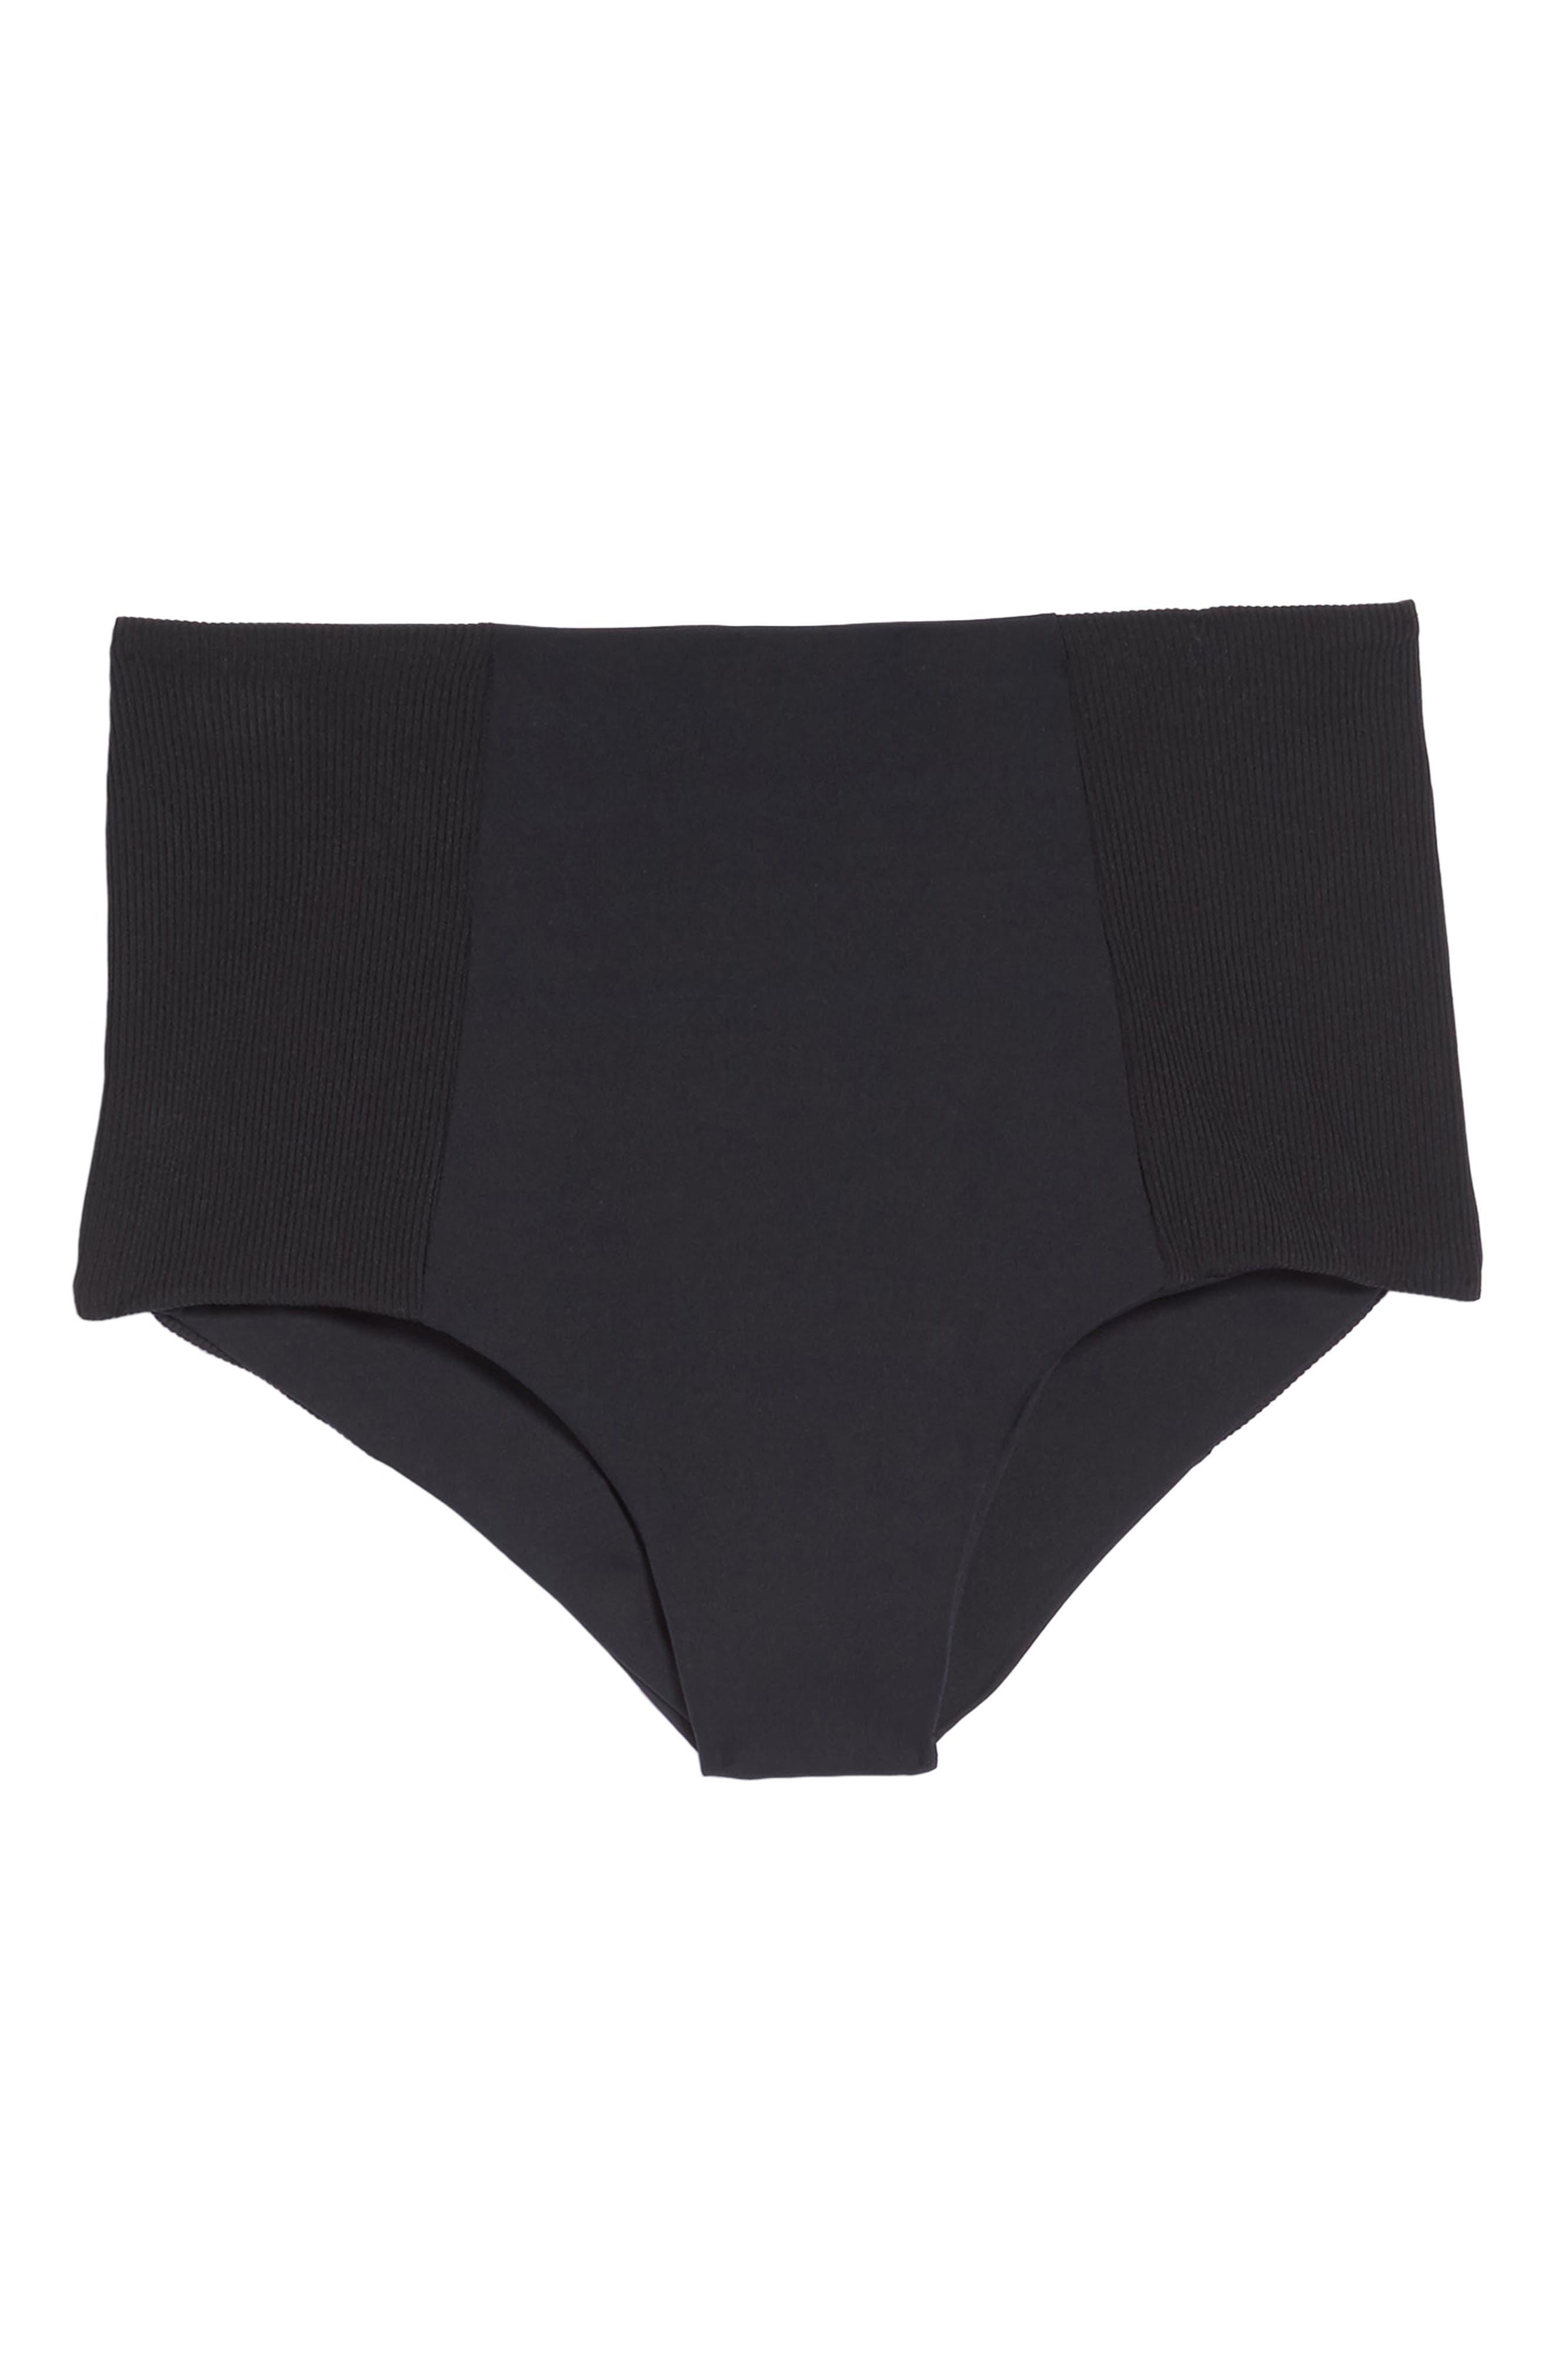 Jackie High Waist Bikini Bottoms,                             Alternate thumbnail 6, color,                             Black